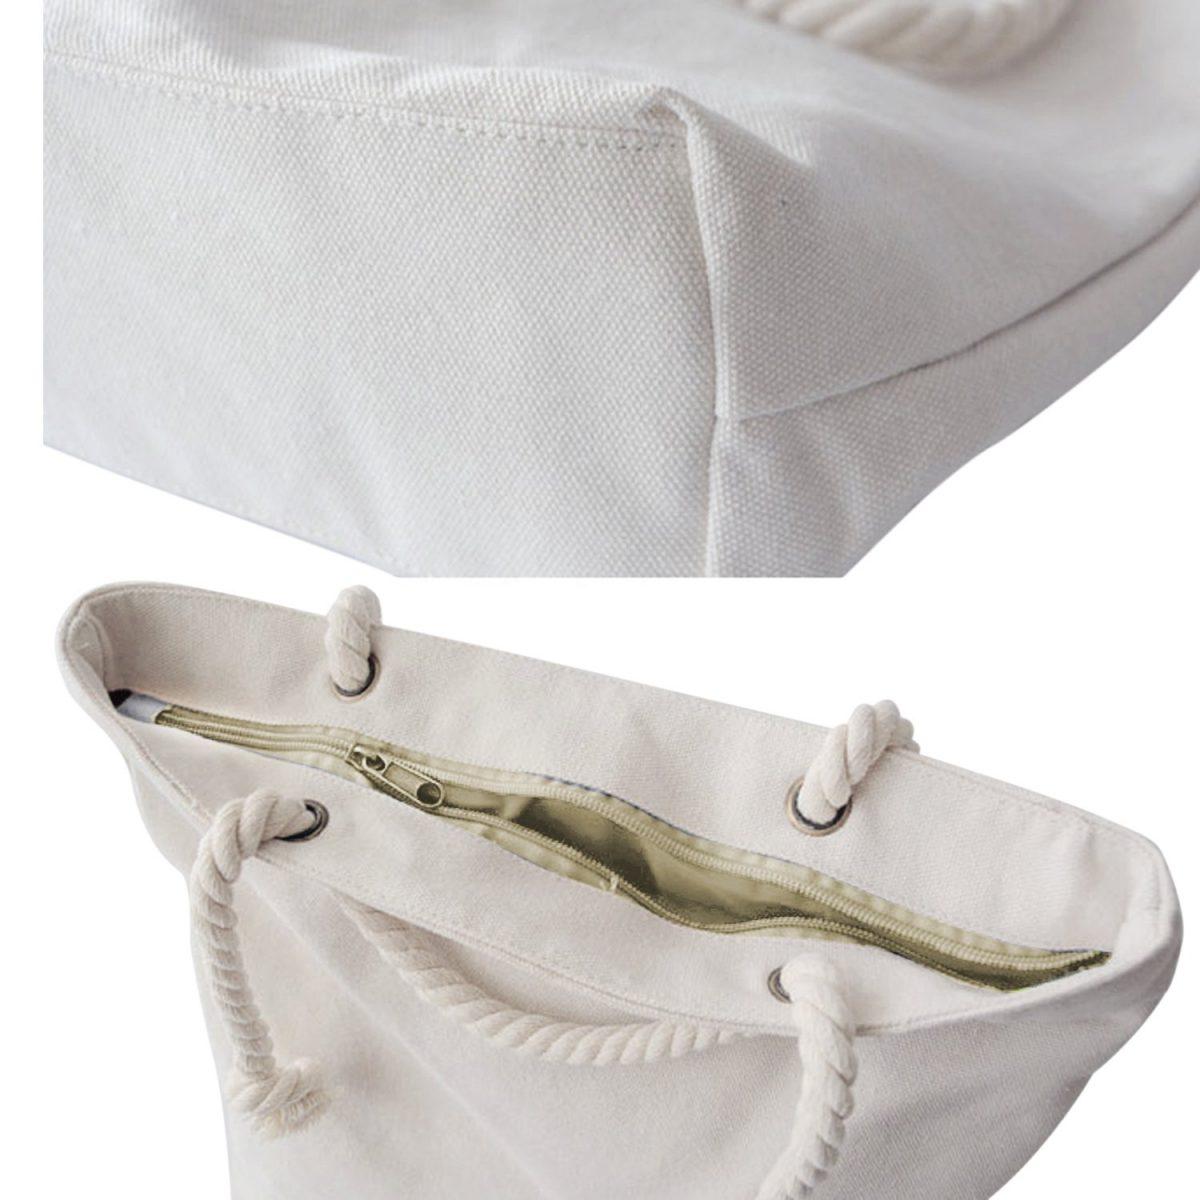 Pembe Zeminde Kartanesi Detaylı Özel Tasarım Fermuarlı Kumaş Çanta Realhomes